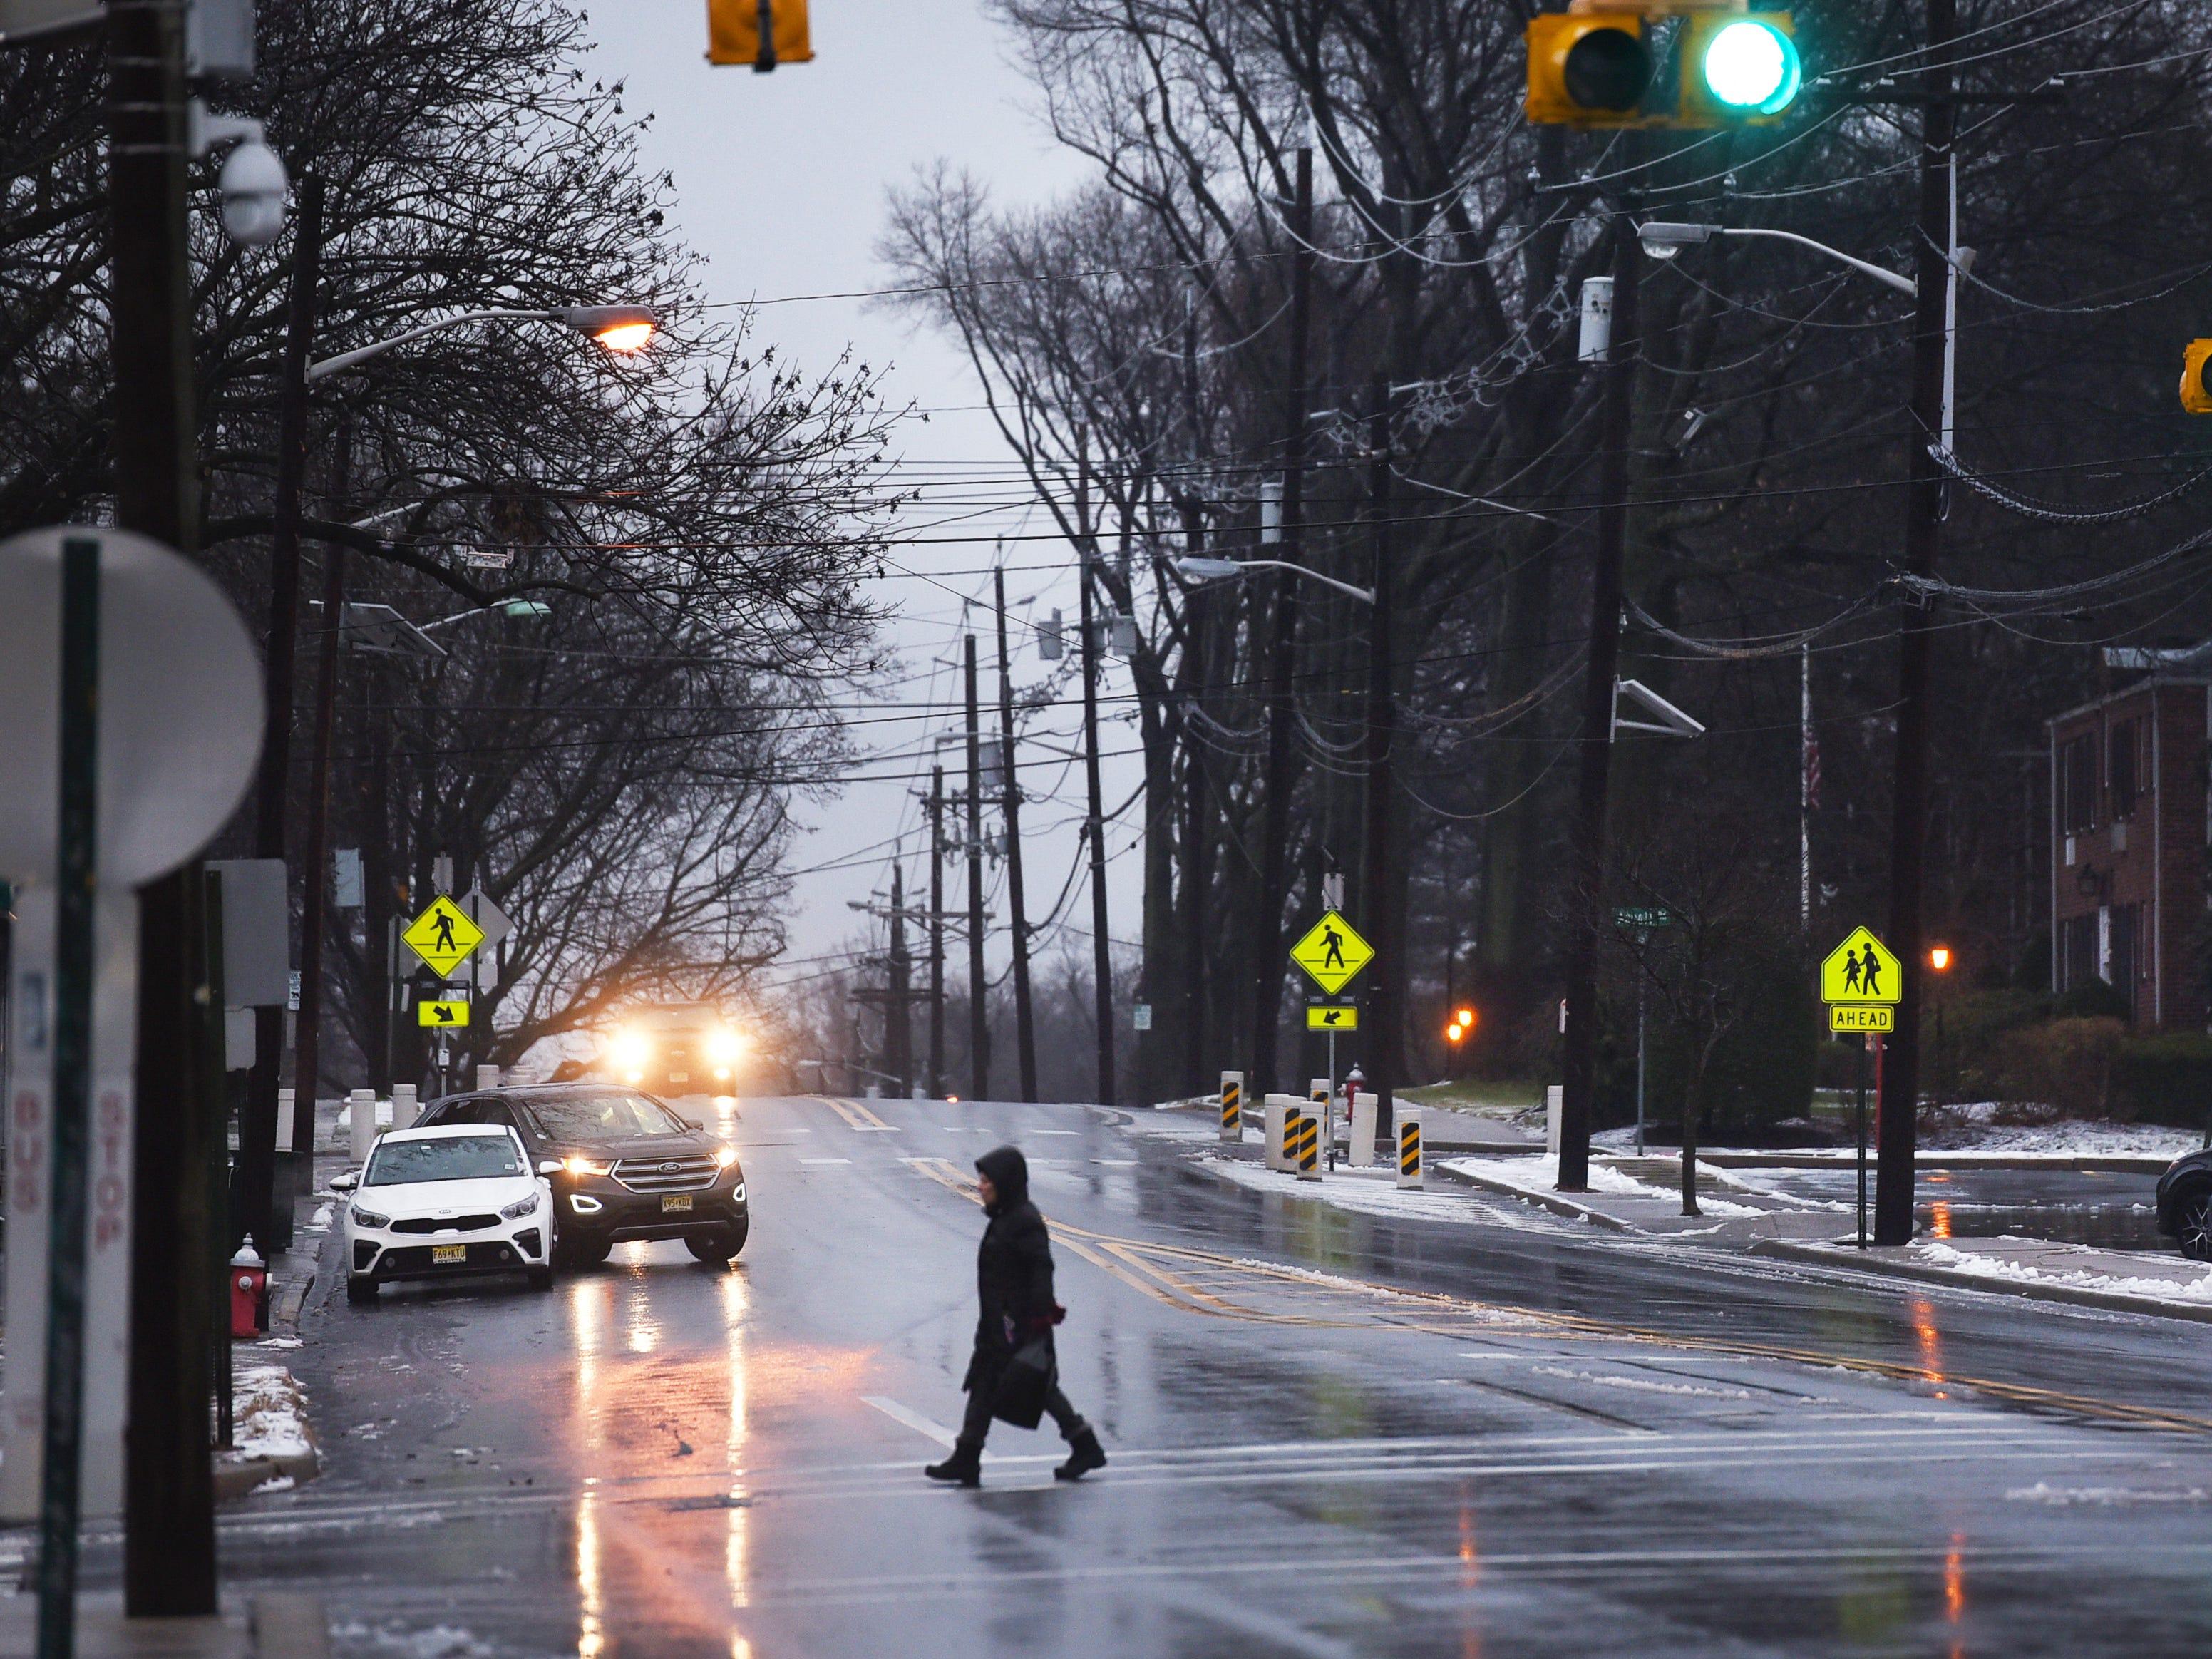 A pedestrian crosses Fair Lawn Avenue on Sunday morning in Fair Lawn, NJ on 01/20/19.